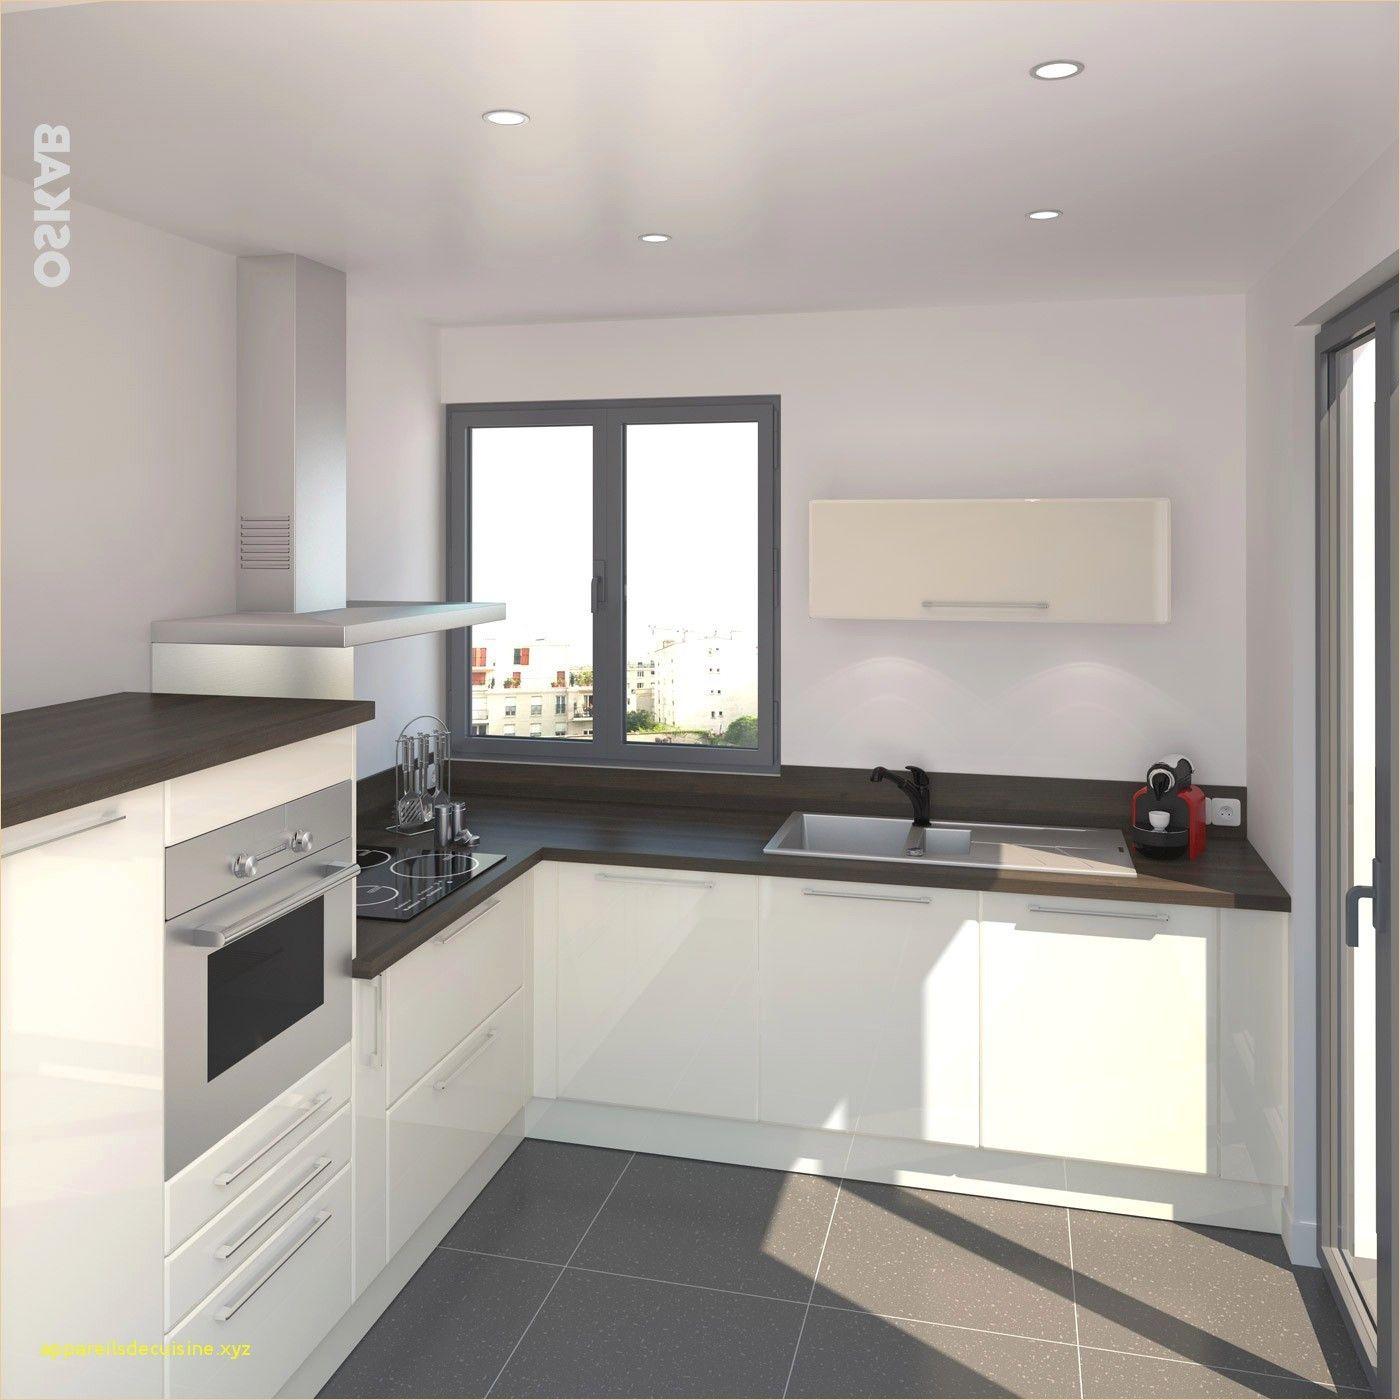 New Carrelage Cuisine Professionnelle White Modern Kitchen Kitchen Decor Kitchen Cabinet Sizes